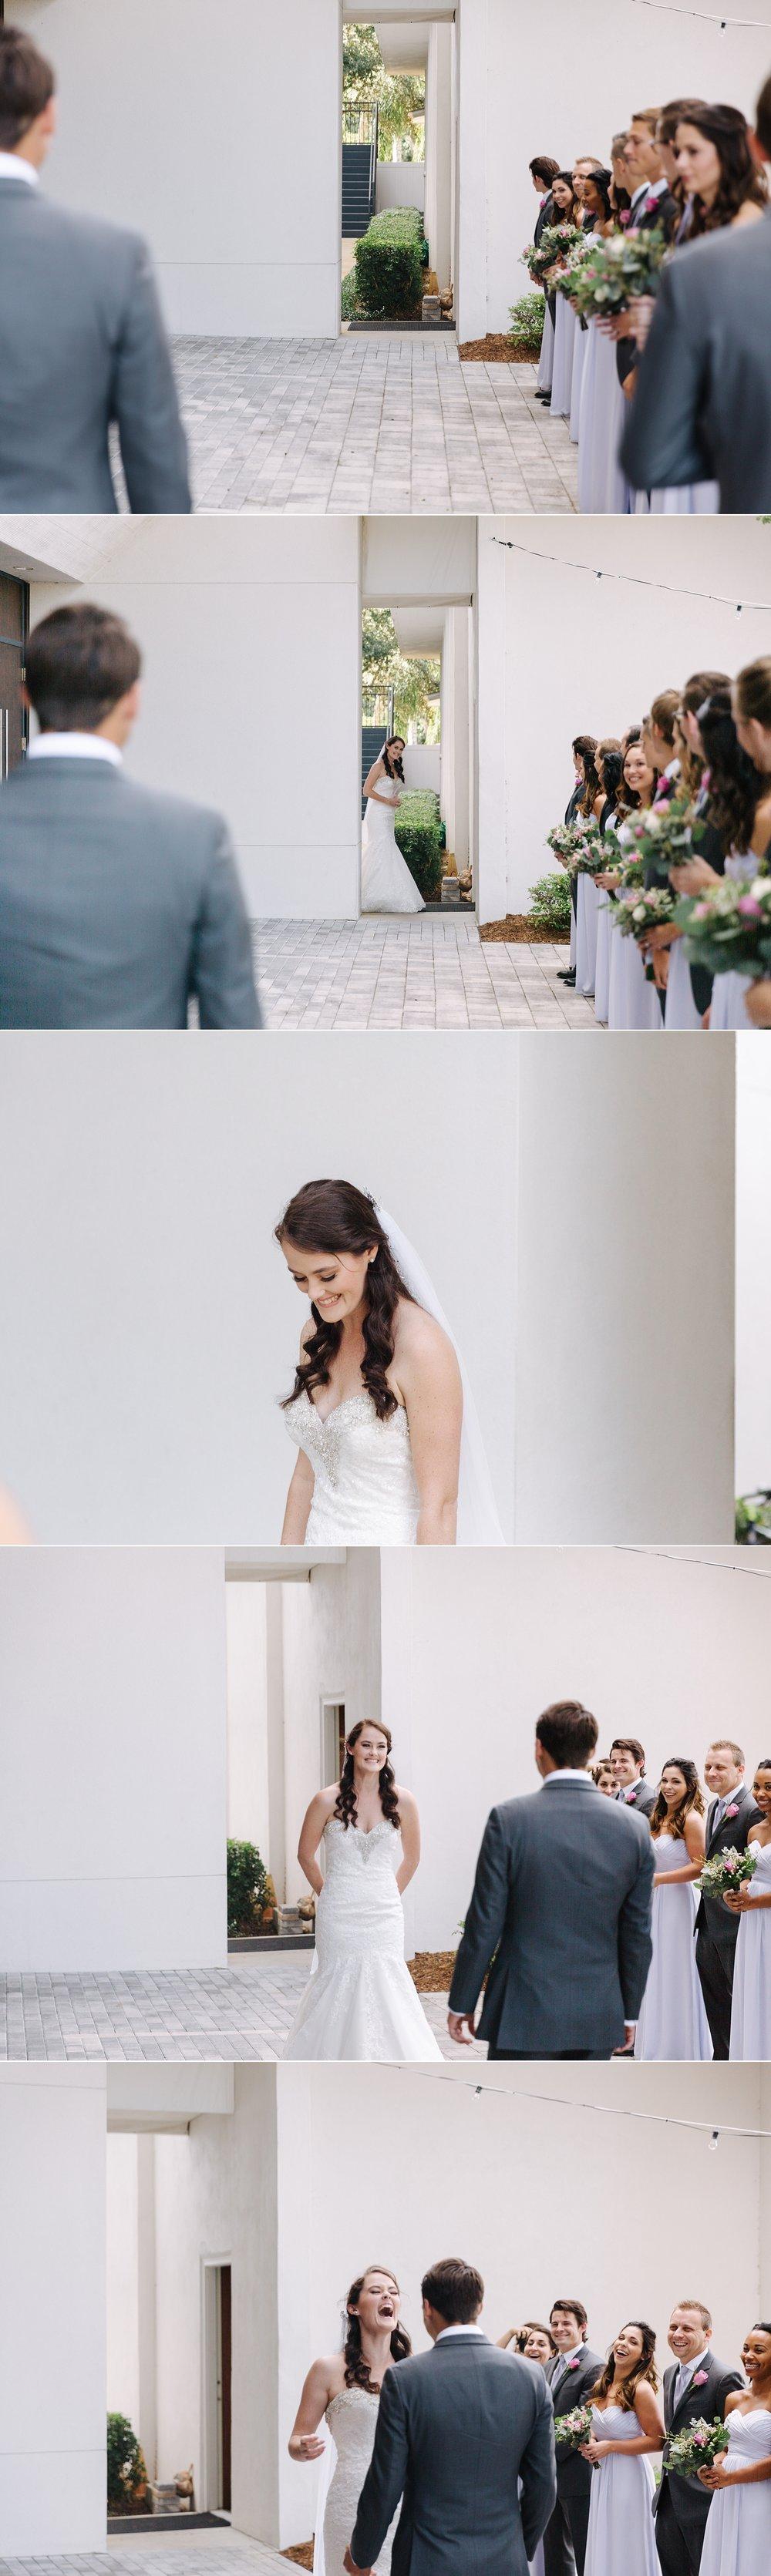 wa wedding blog-16.jpg